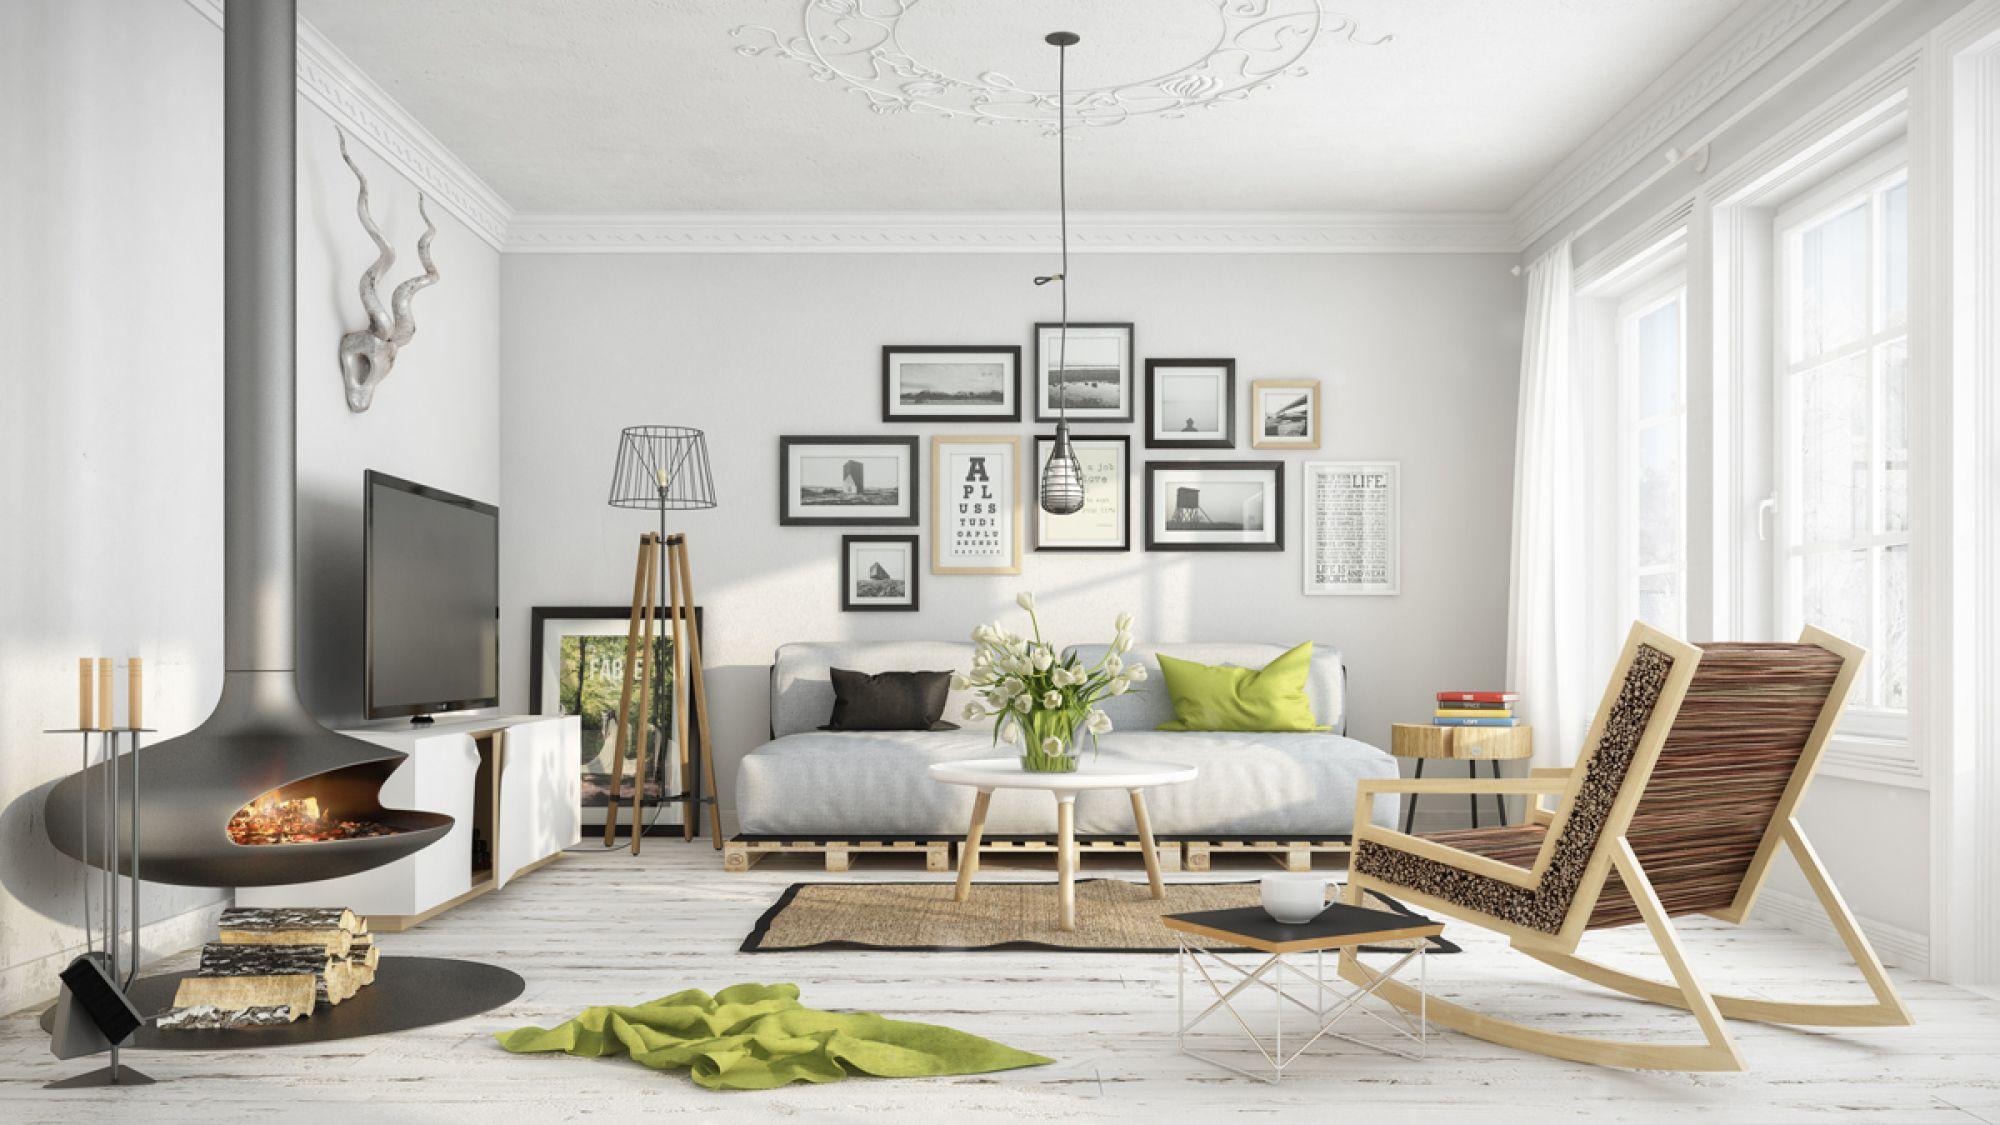 swedish design swedish interior design interior decor